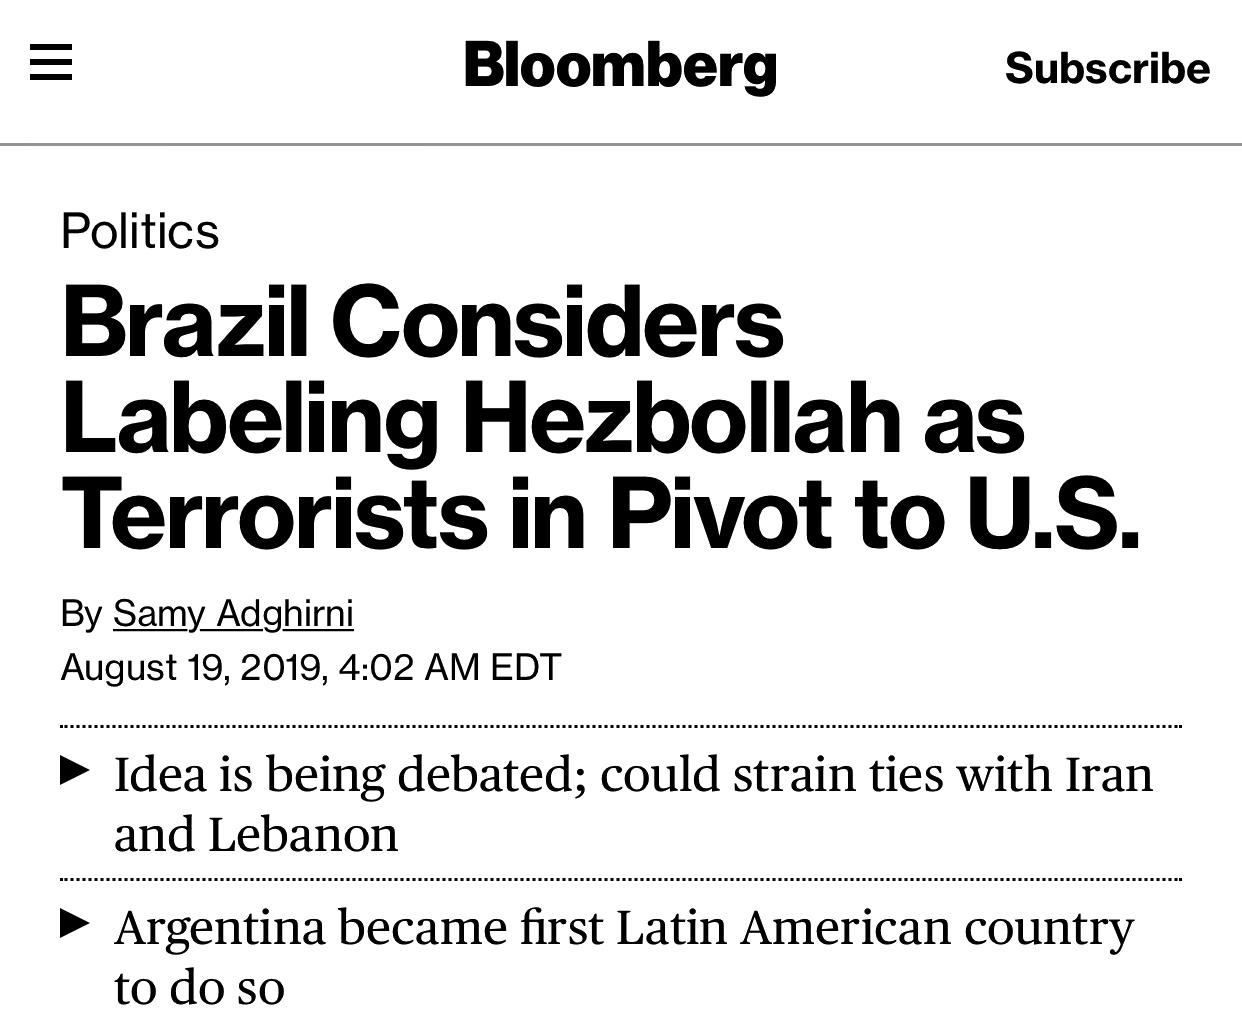 Brazil Considers Labeling Hezbollah as Terrorists in Pivot to U.S.